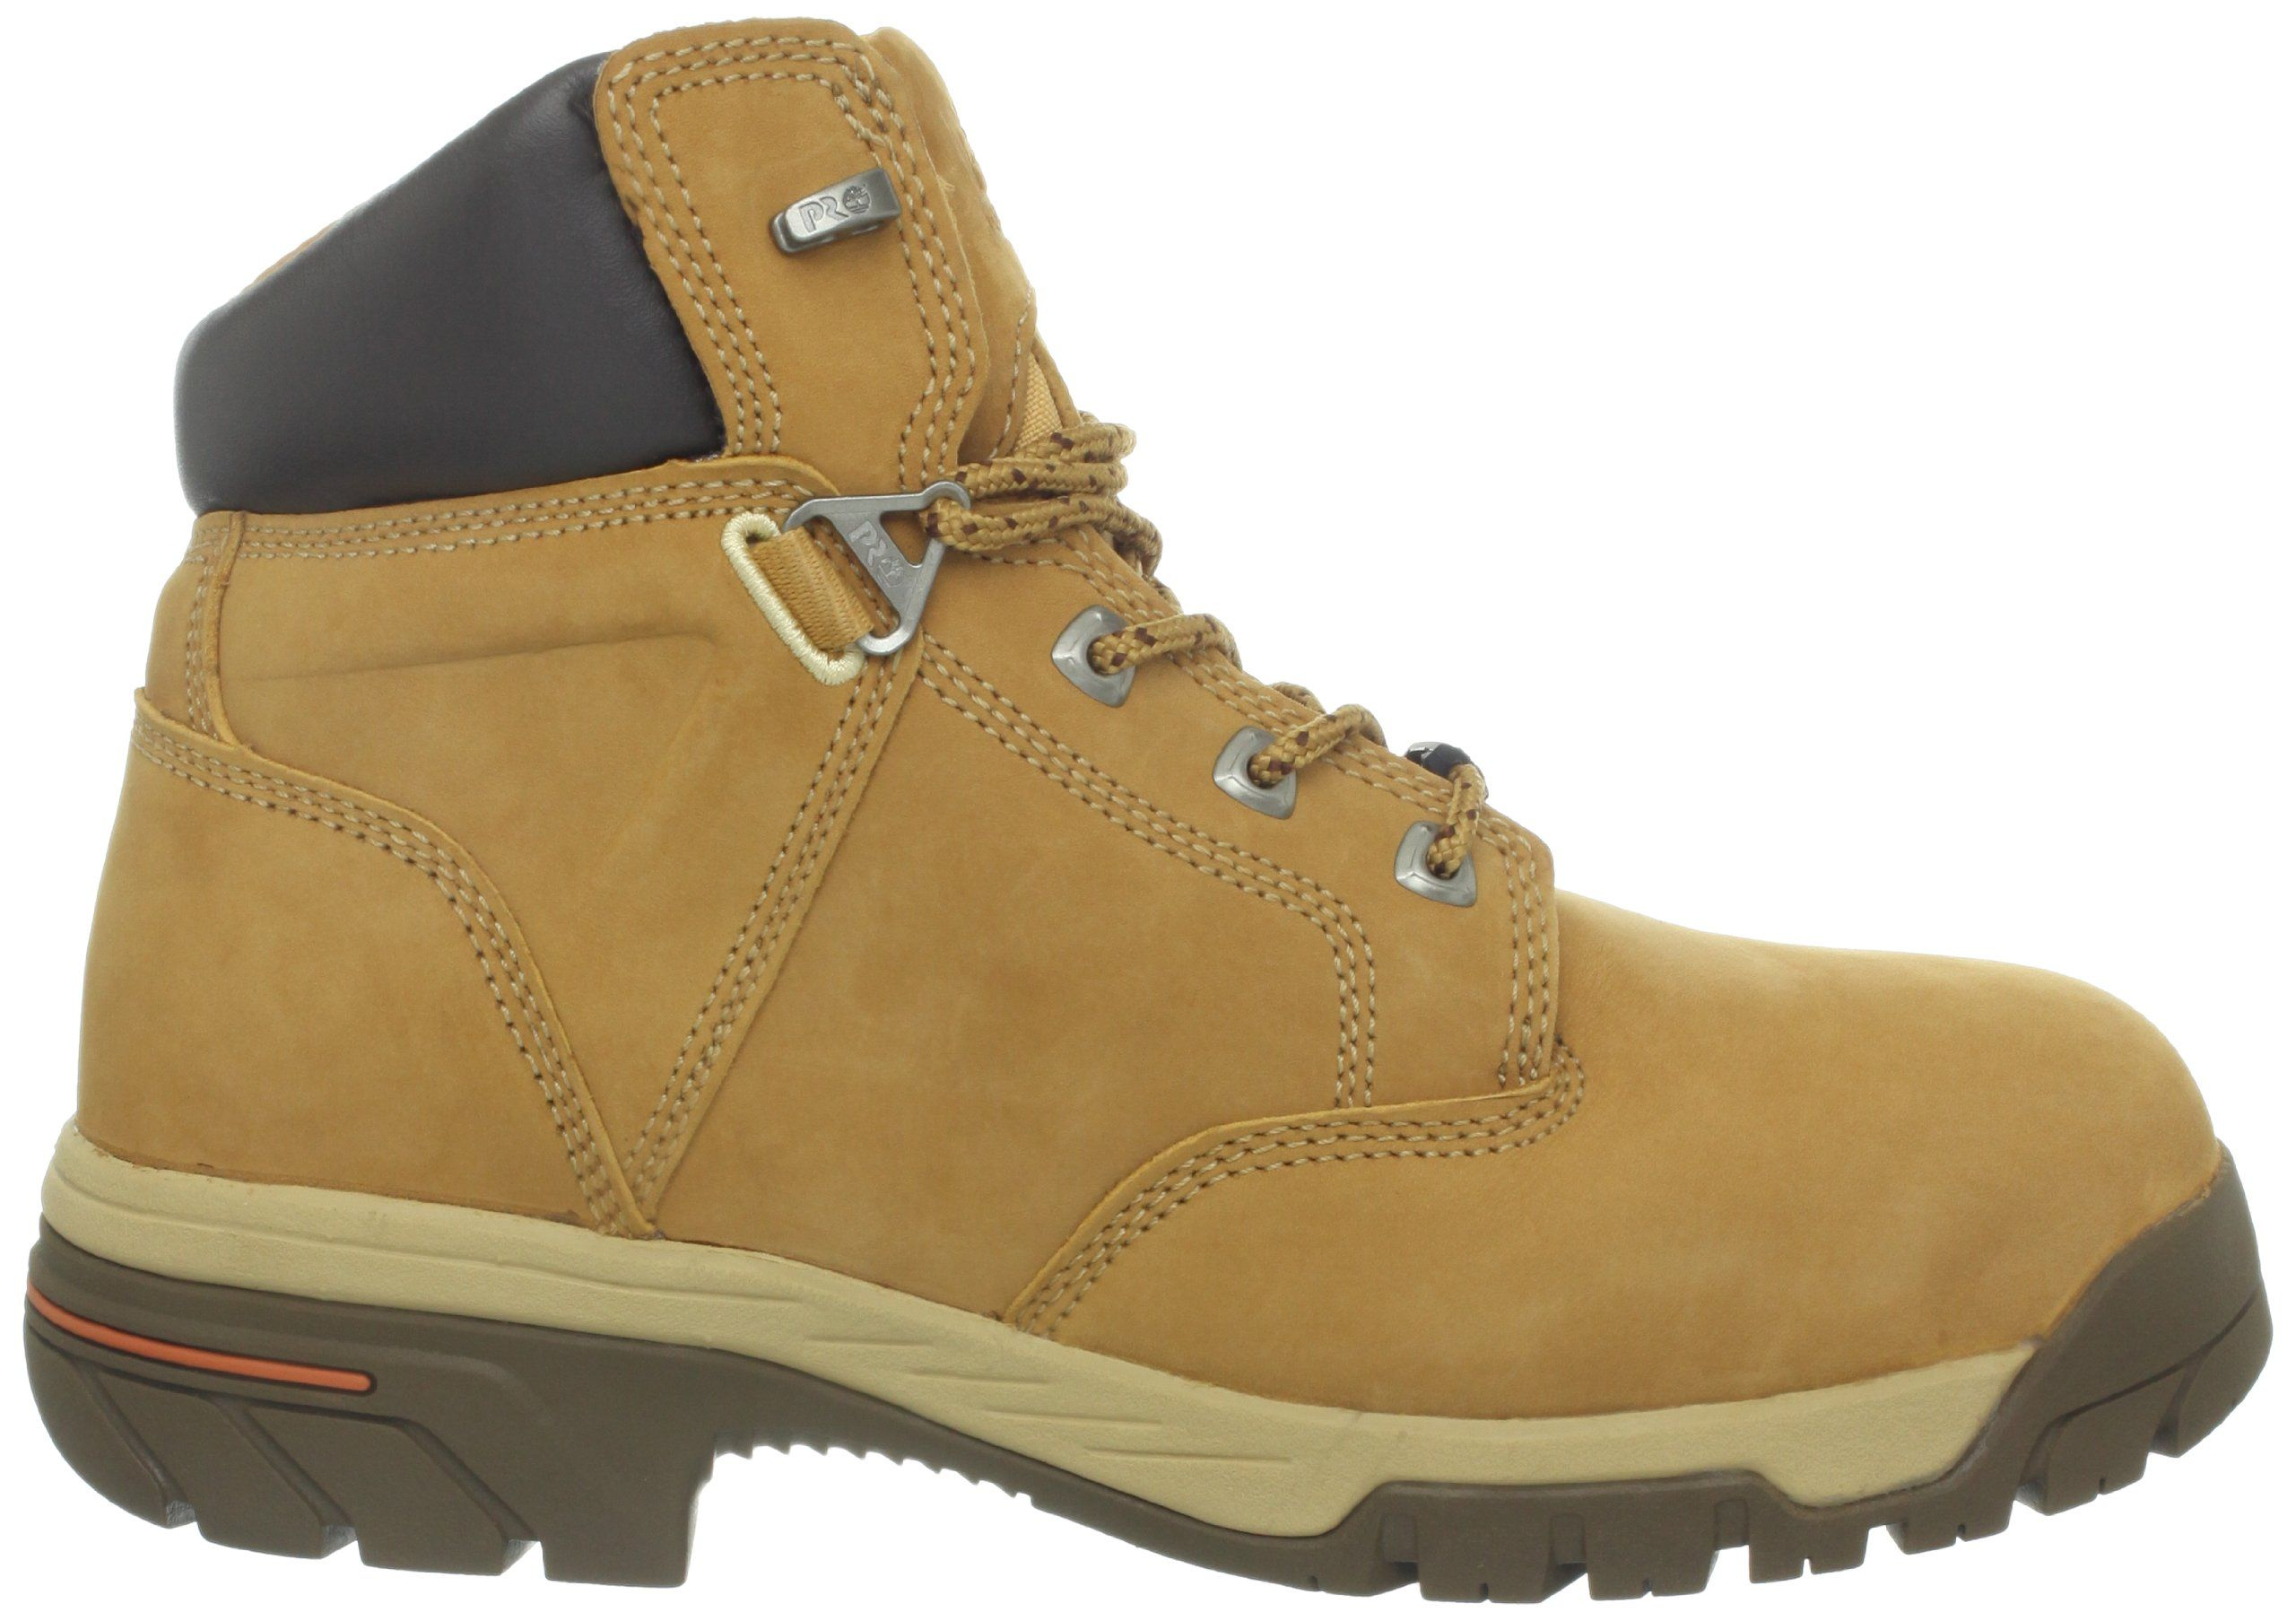 Timberland PRO Mens Helix 6 Inch Waterproof IN Comp Toe Work BootWheat  Nubuck10 W US >